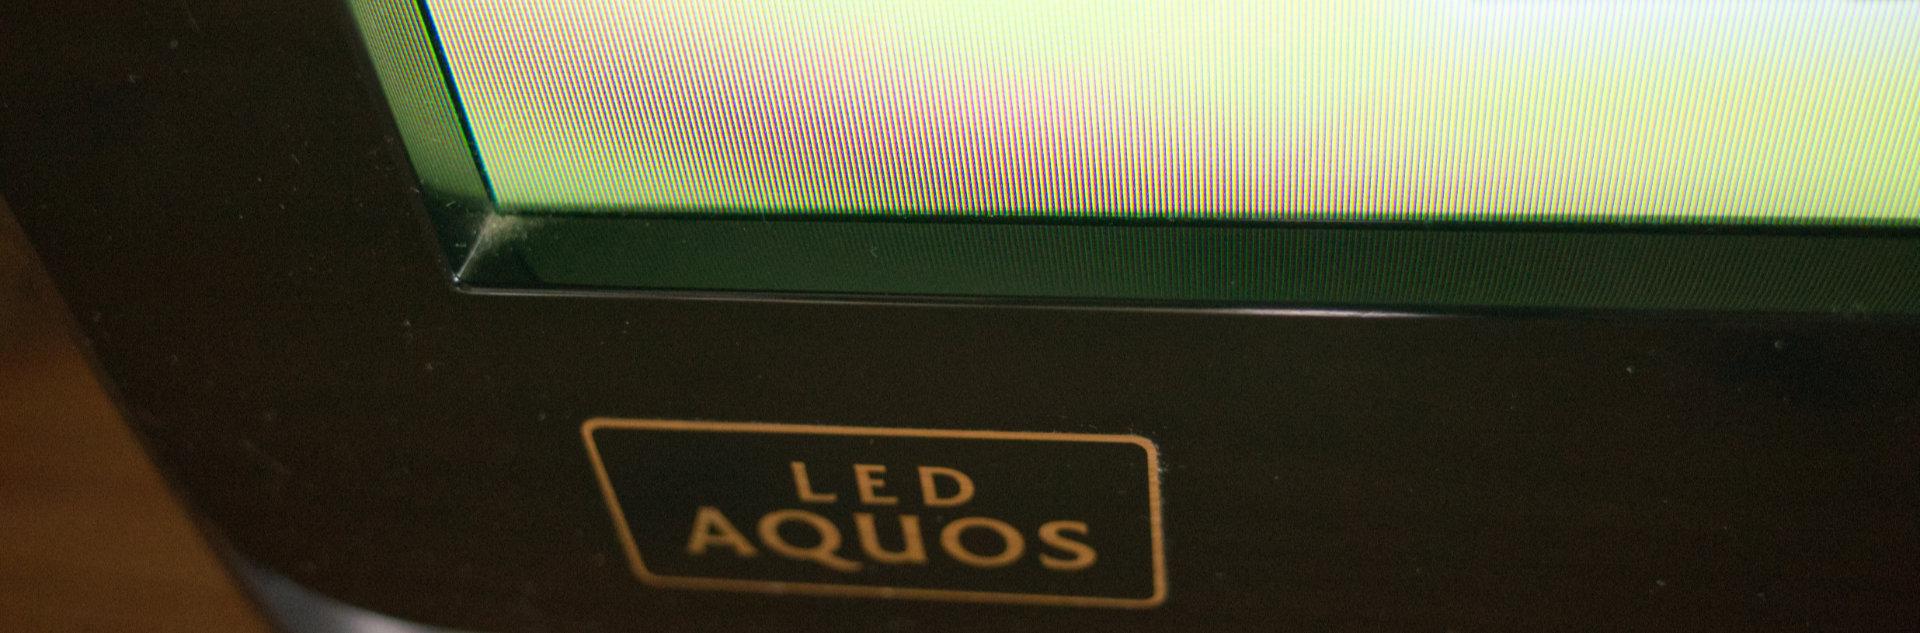 AQUOS LED 液晶テレビのモニター構造(パネルと枠)